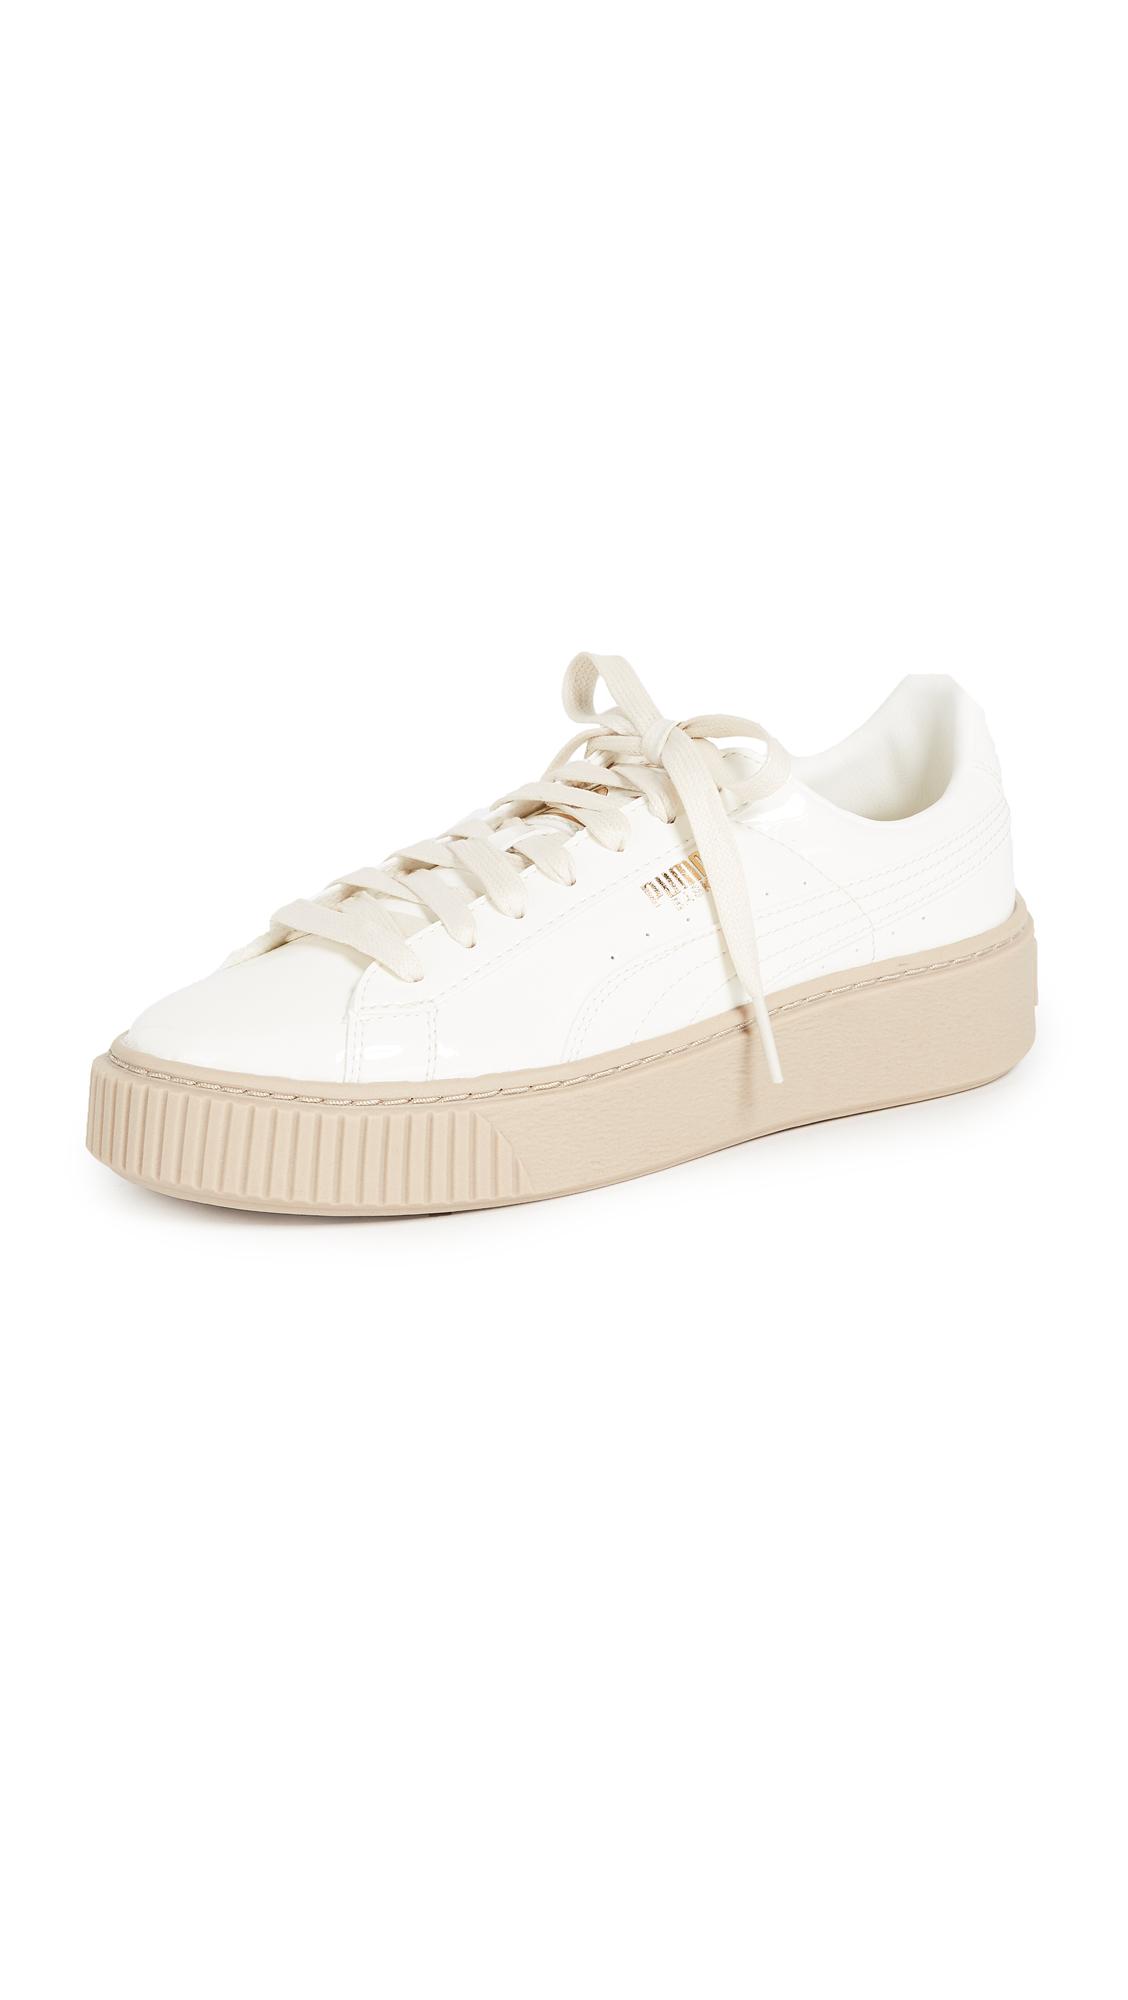 PUMA Basket Platform Patent Sneakers - White